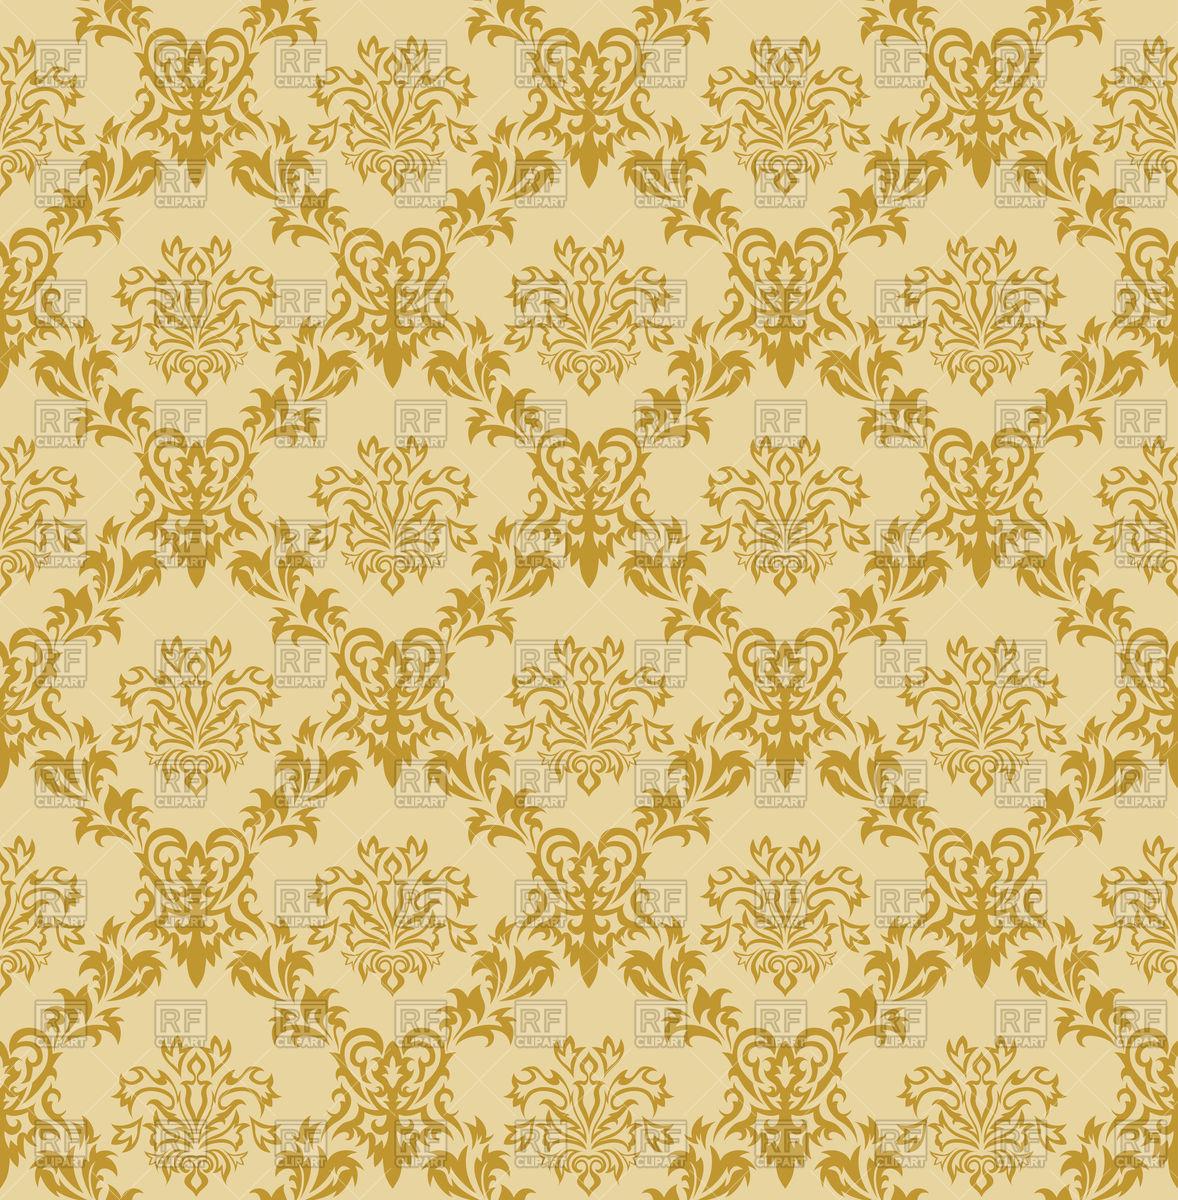 Seamless antique pattern.